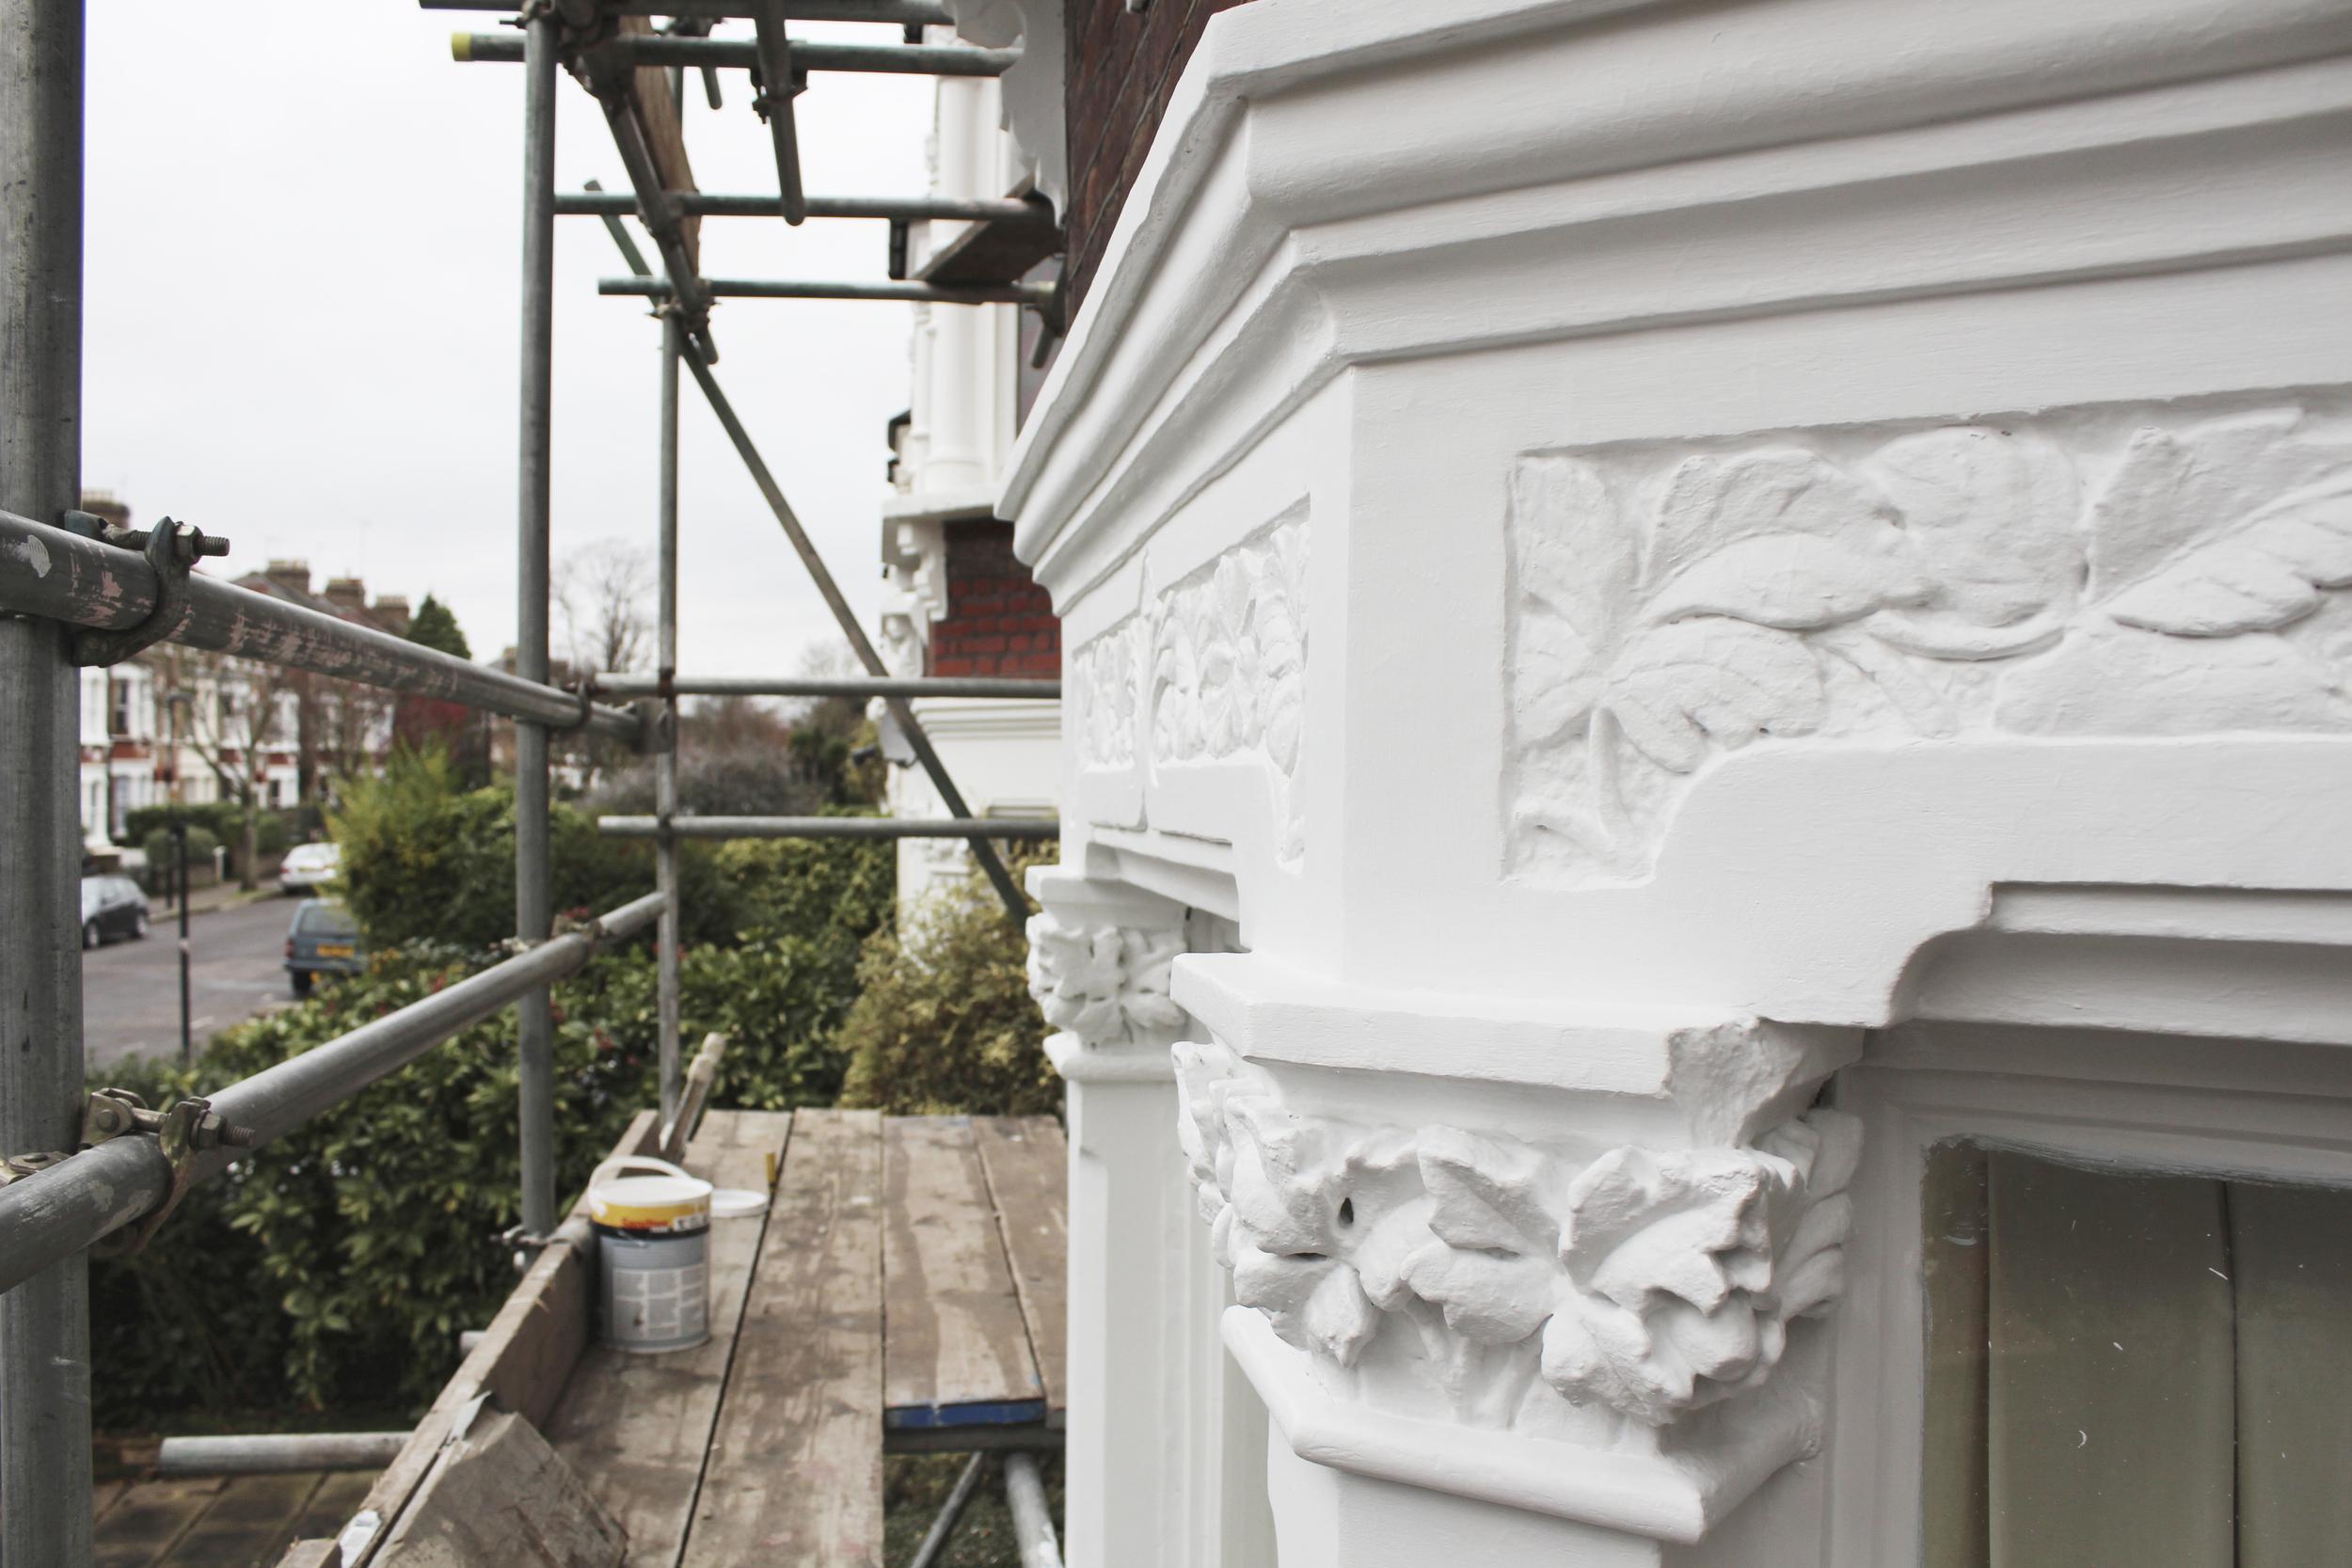 #NHRenovations #Painter #Decorator #London #TufnellPark #Exterior #Victorian #Sash #Windows #Prepwork